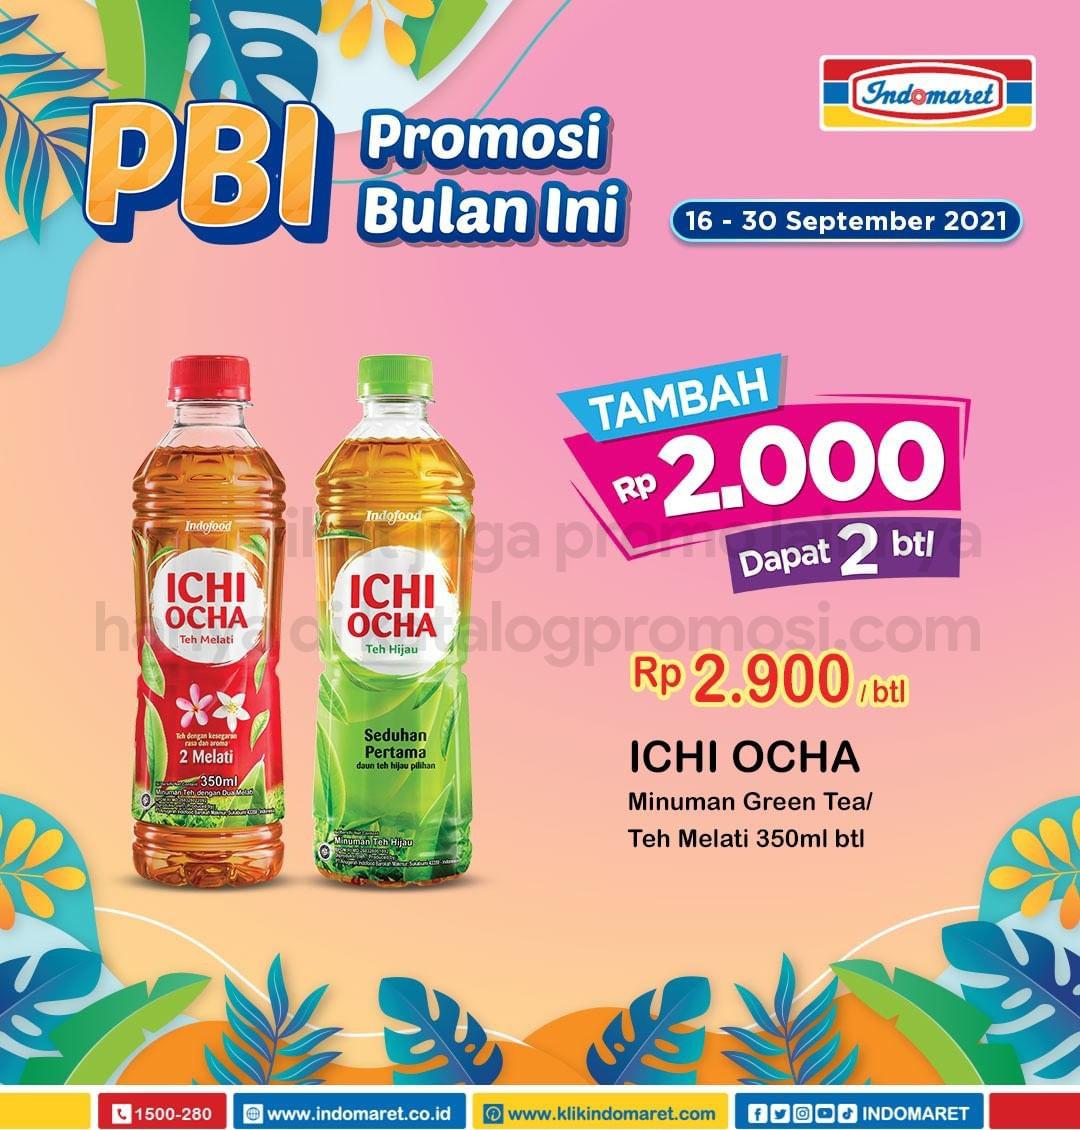 Promo INDOMARET BULAN INI periode 16-30 September 2021